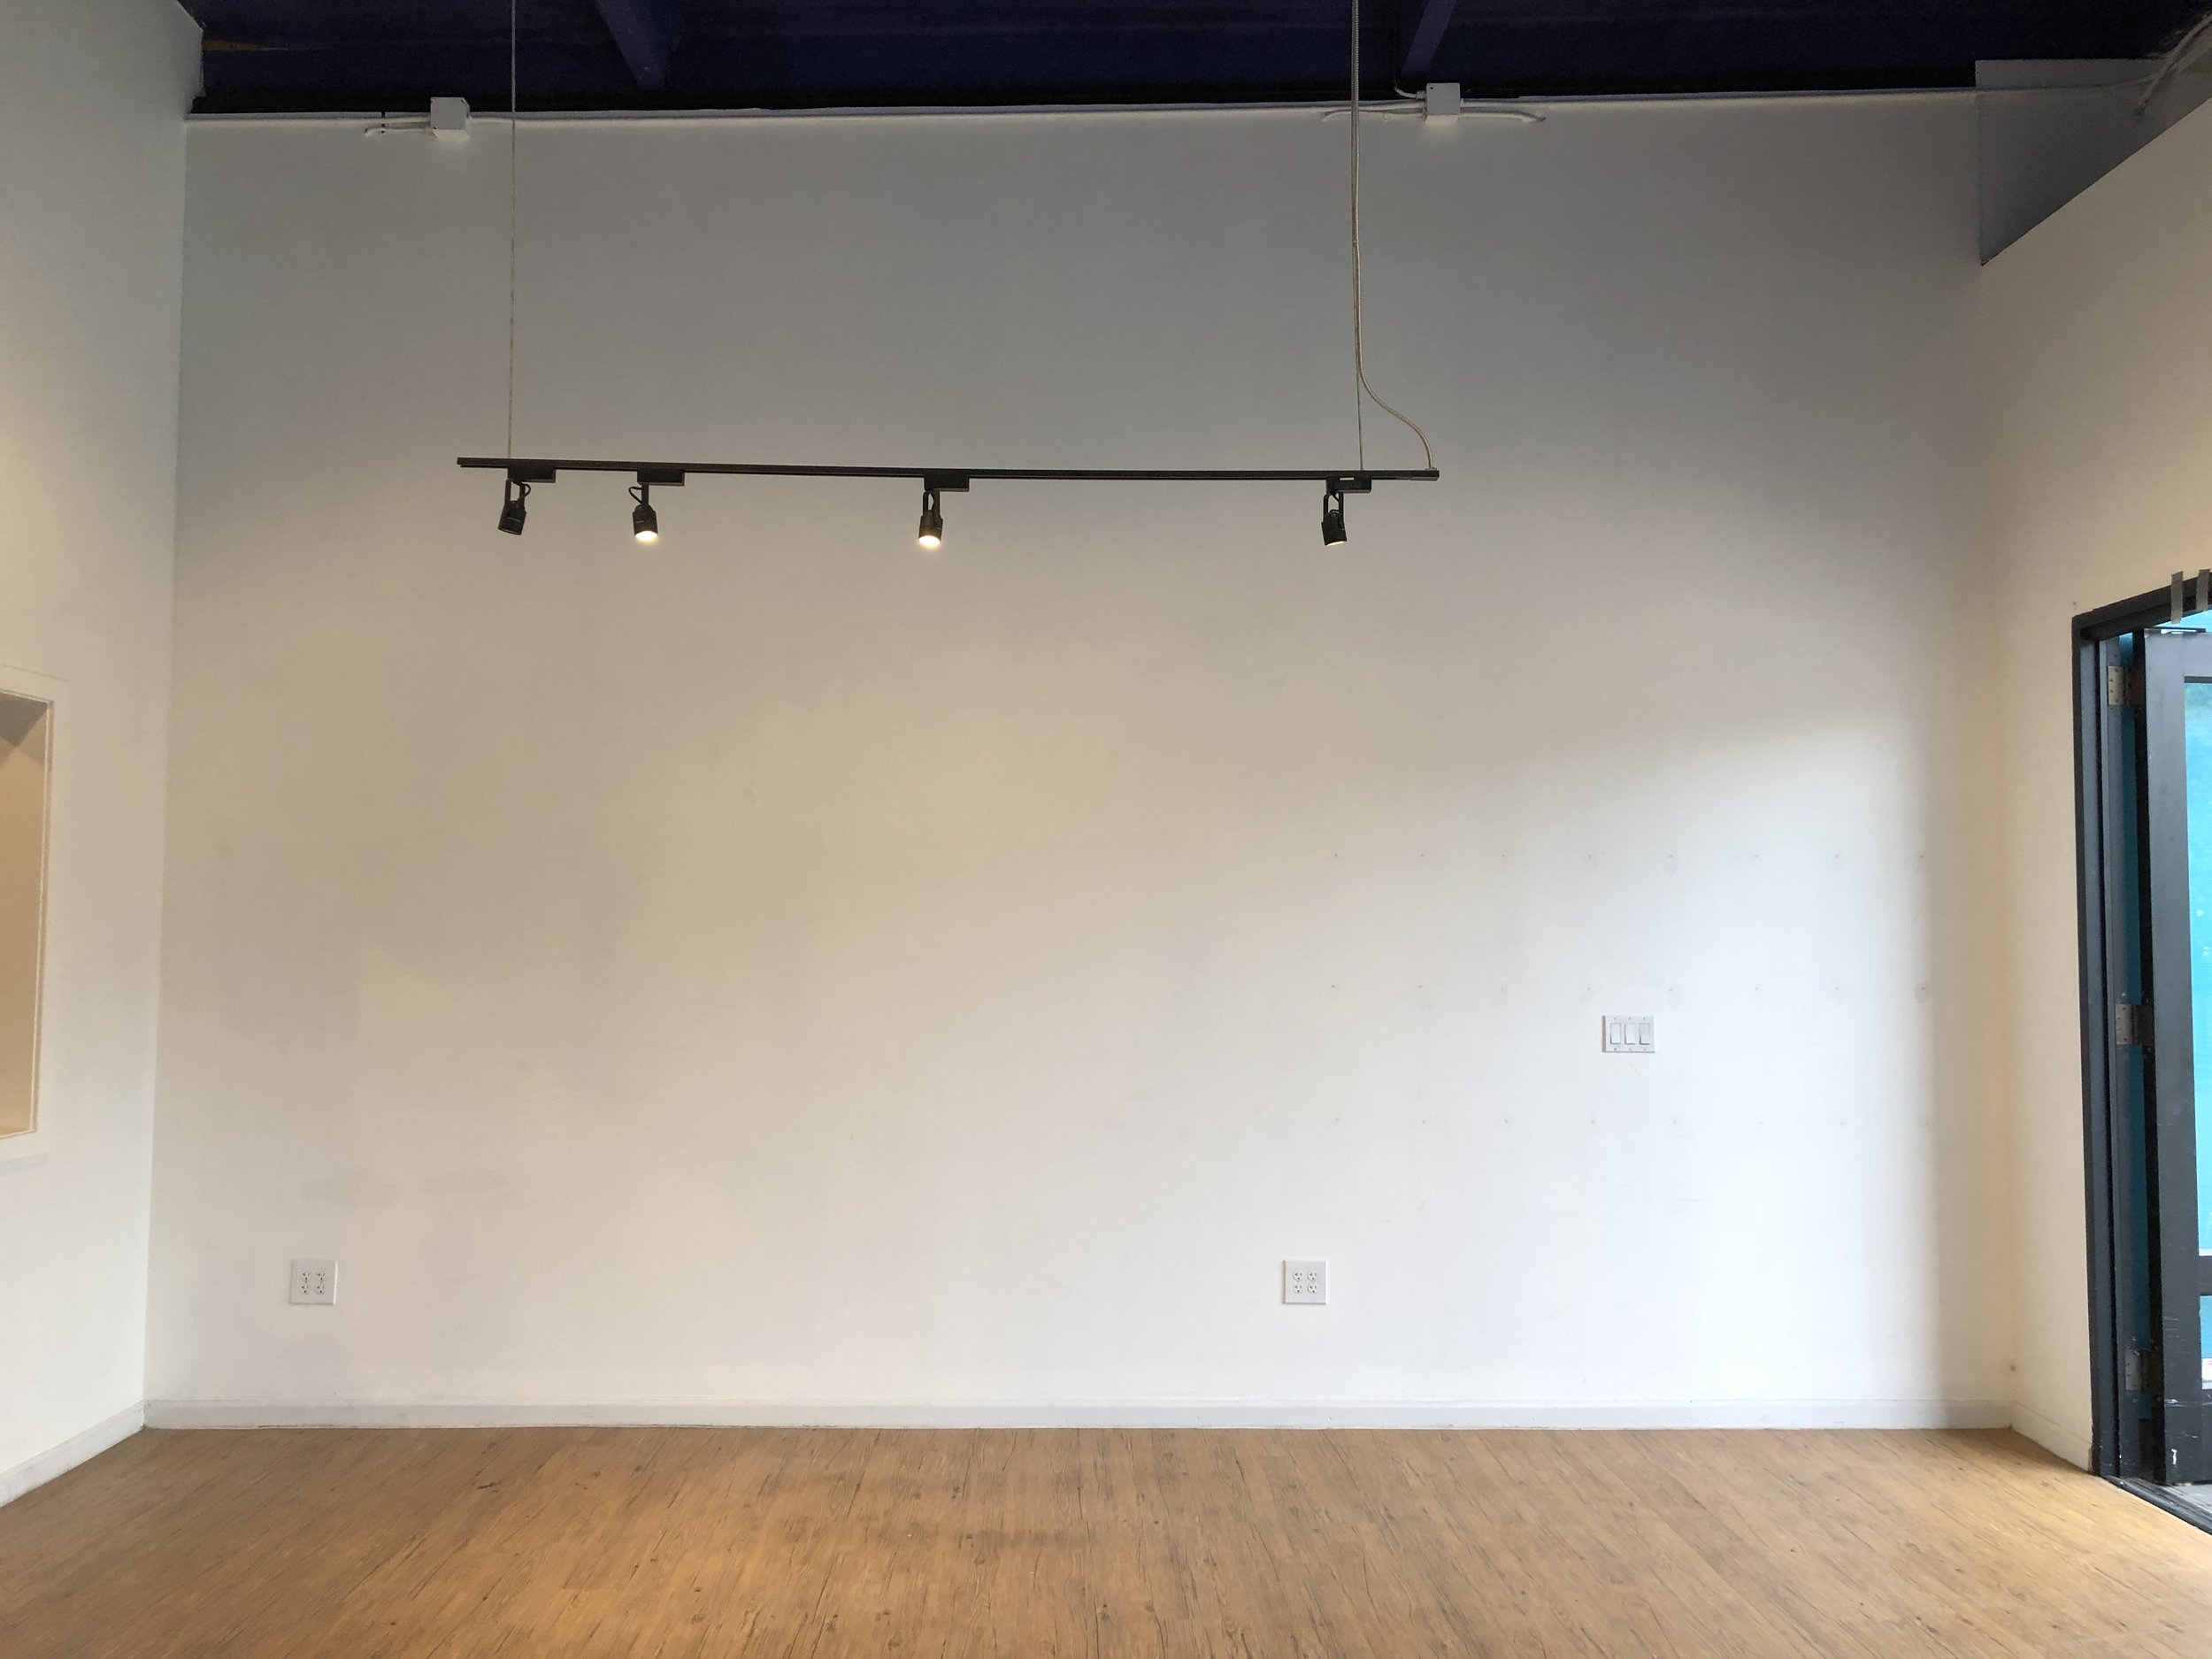 BEFORE: Sad white walls